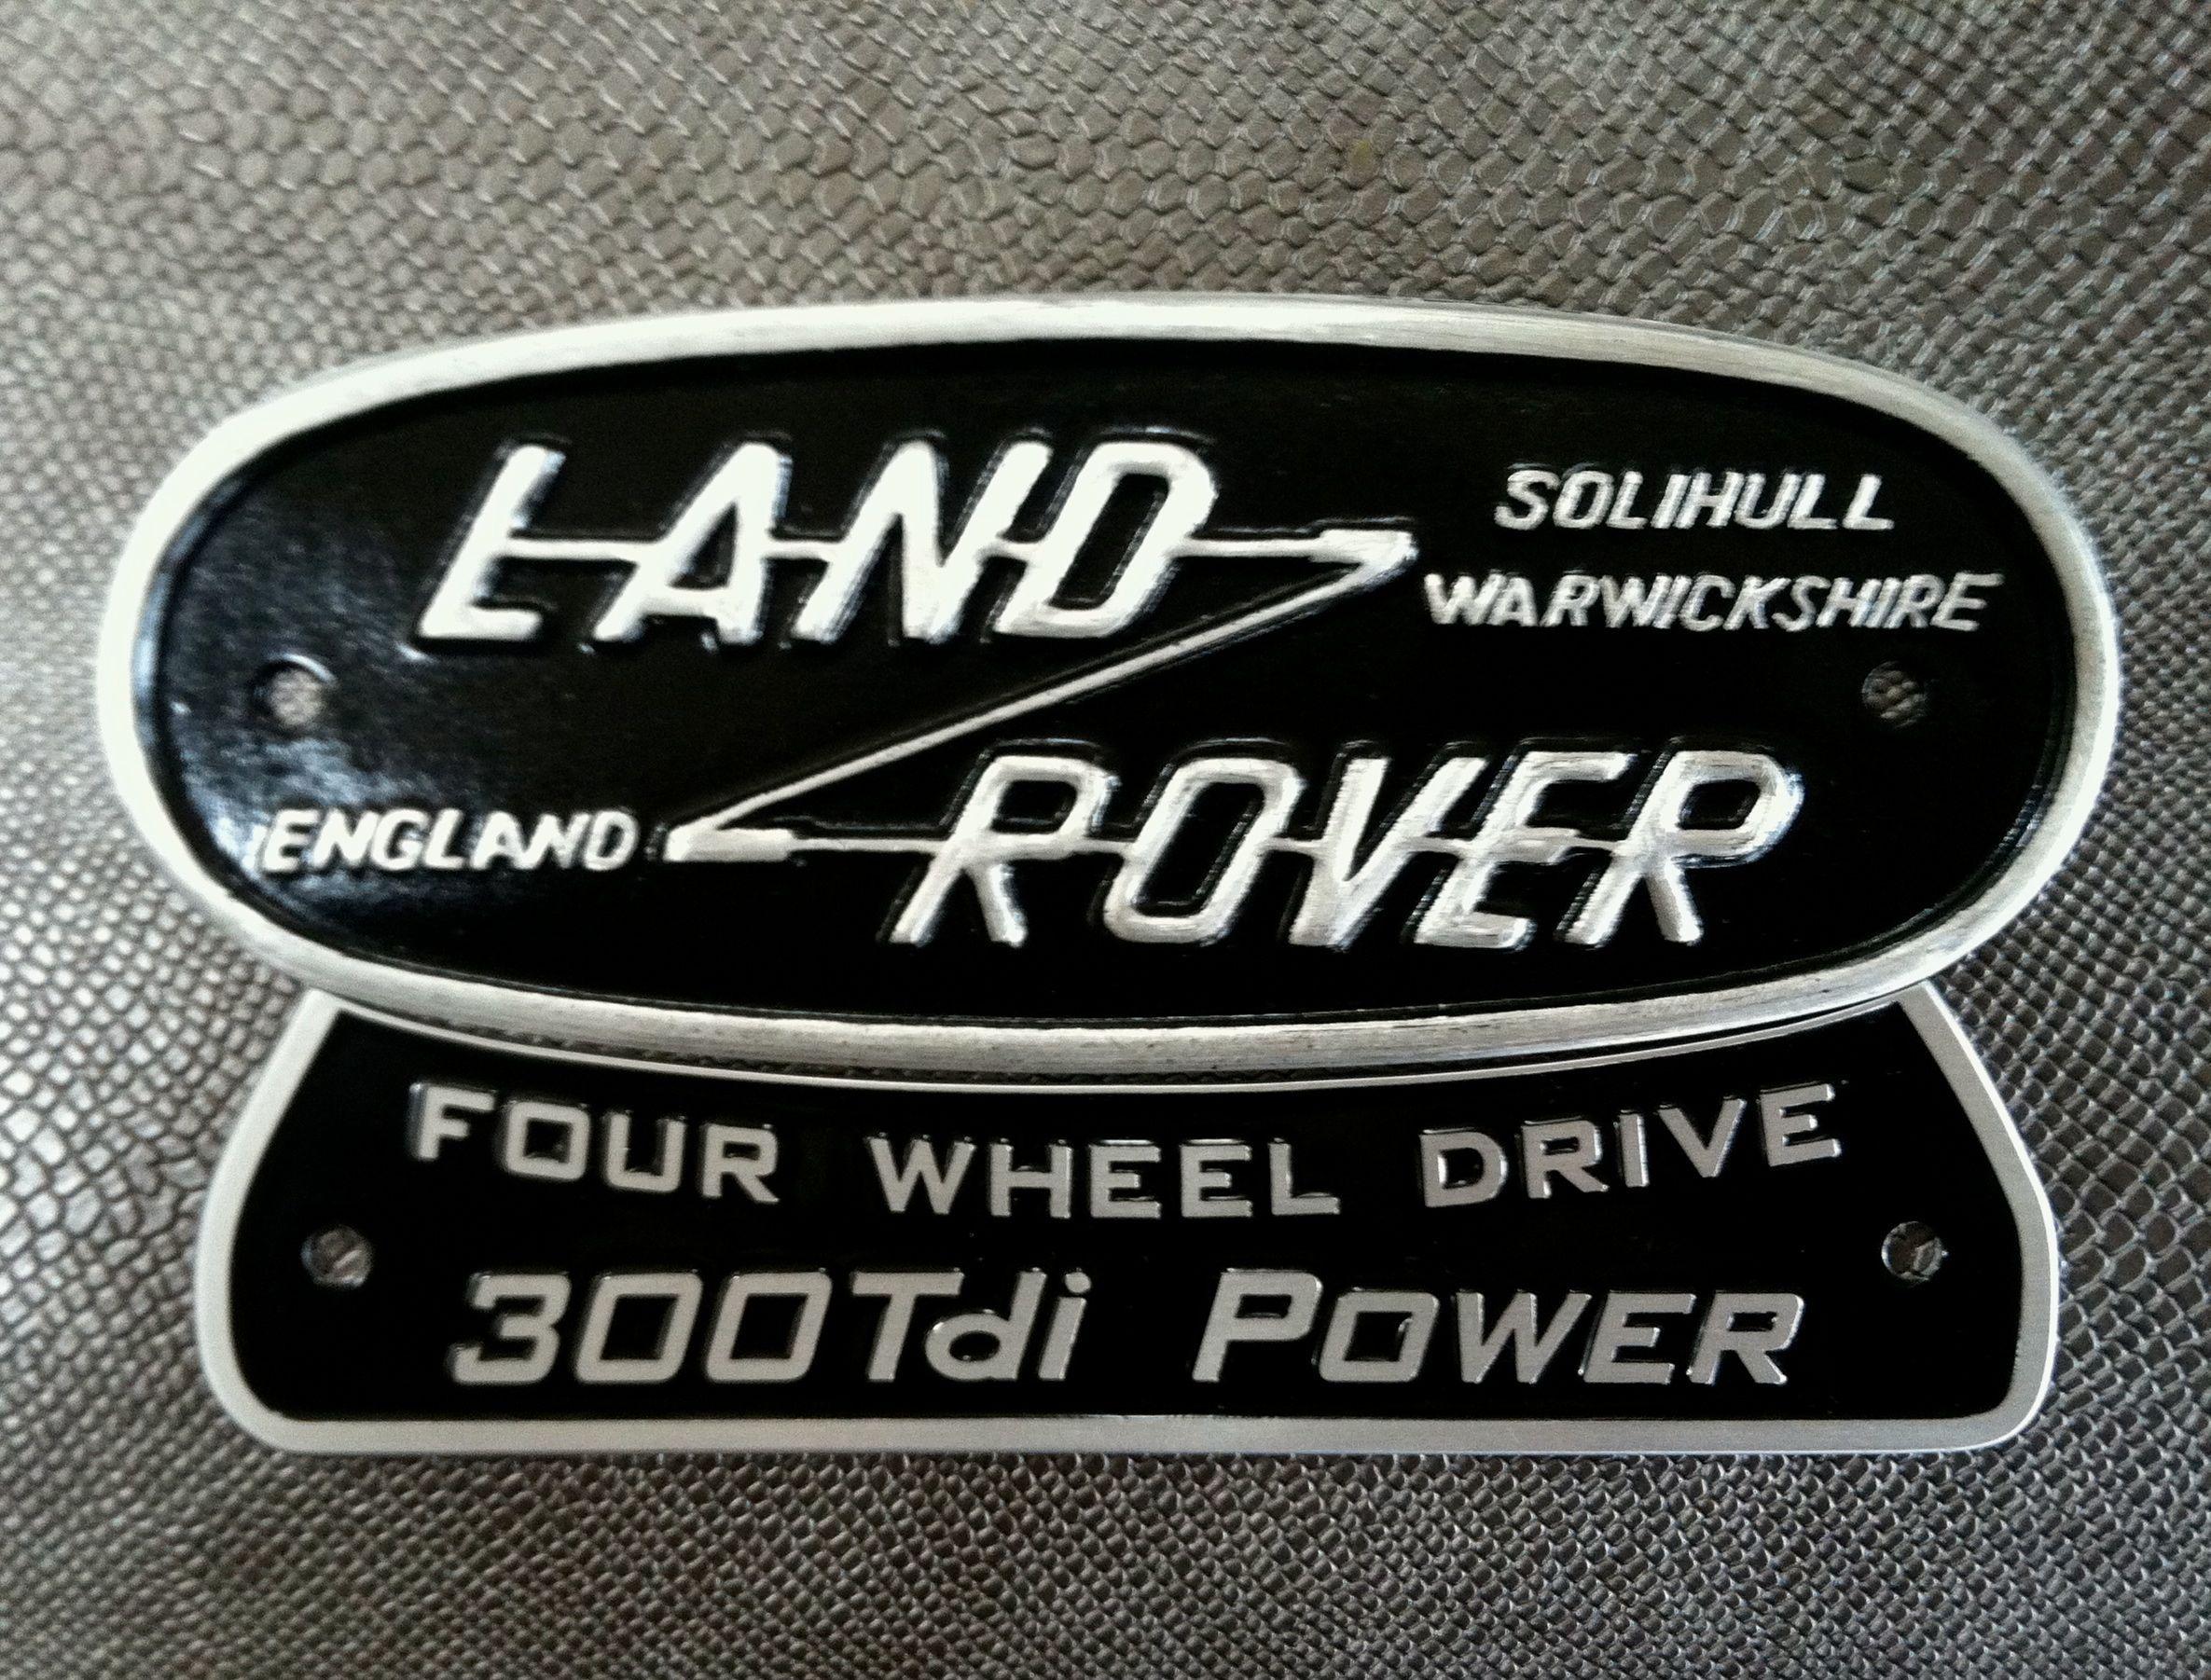 Vintage Land Rover rear badge found on ebay